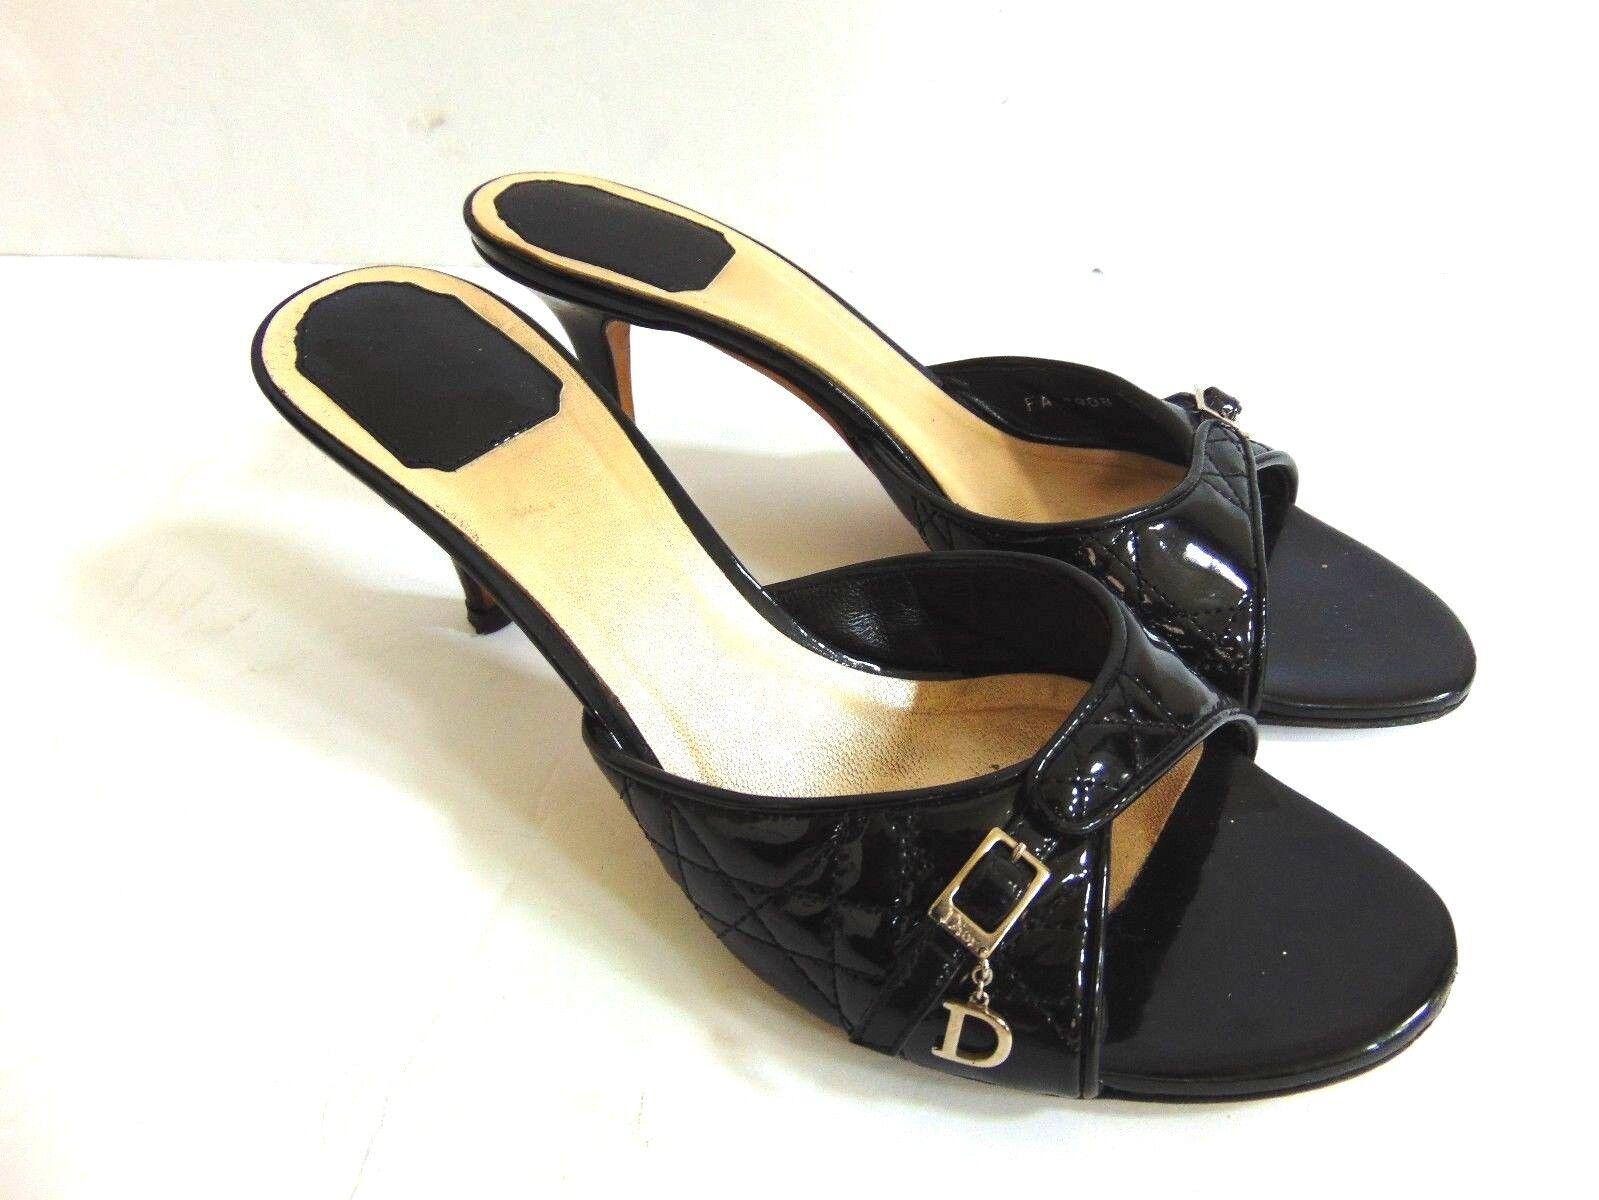 Christian Dior Black Cannage Patent Leather Slide Sandals Heels Size 38 1/2 US 8